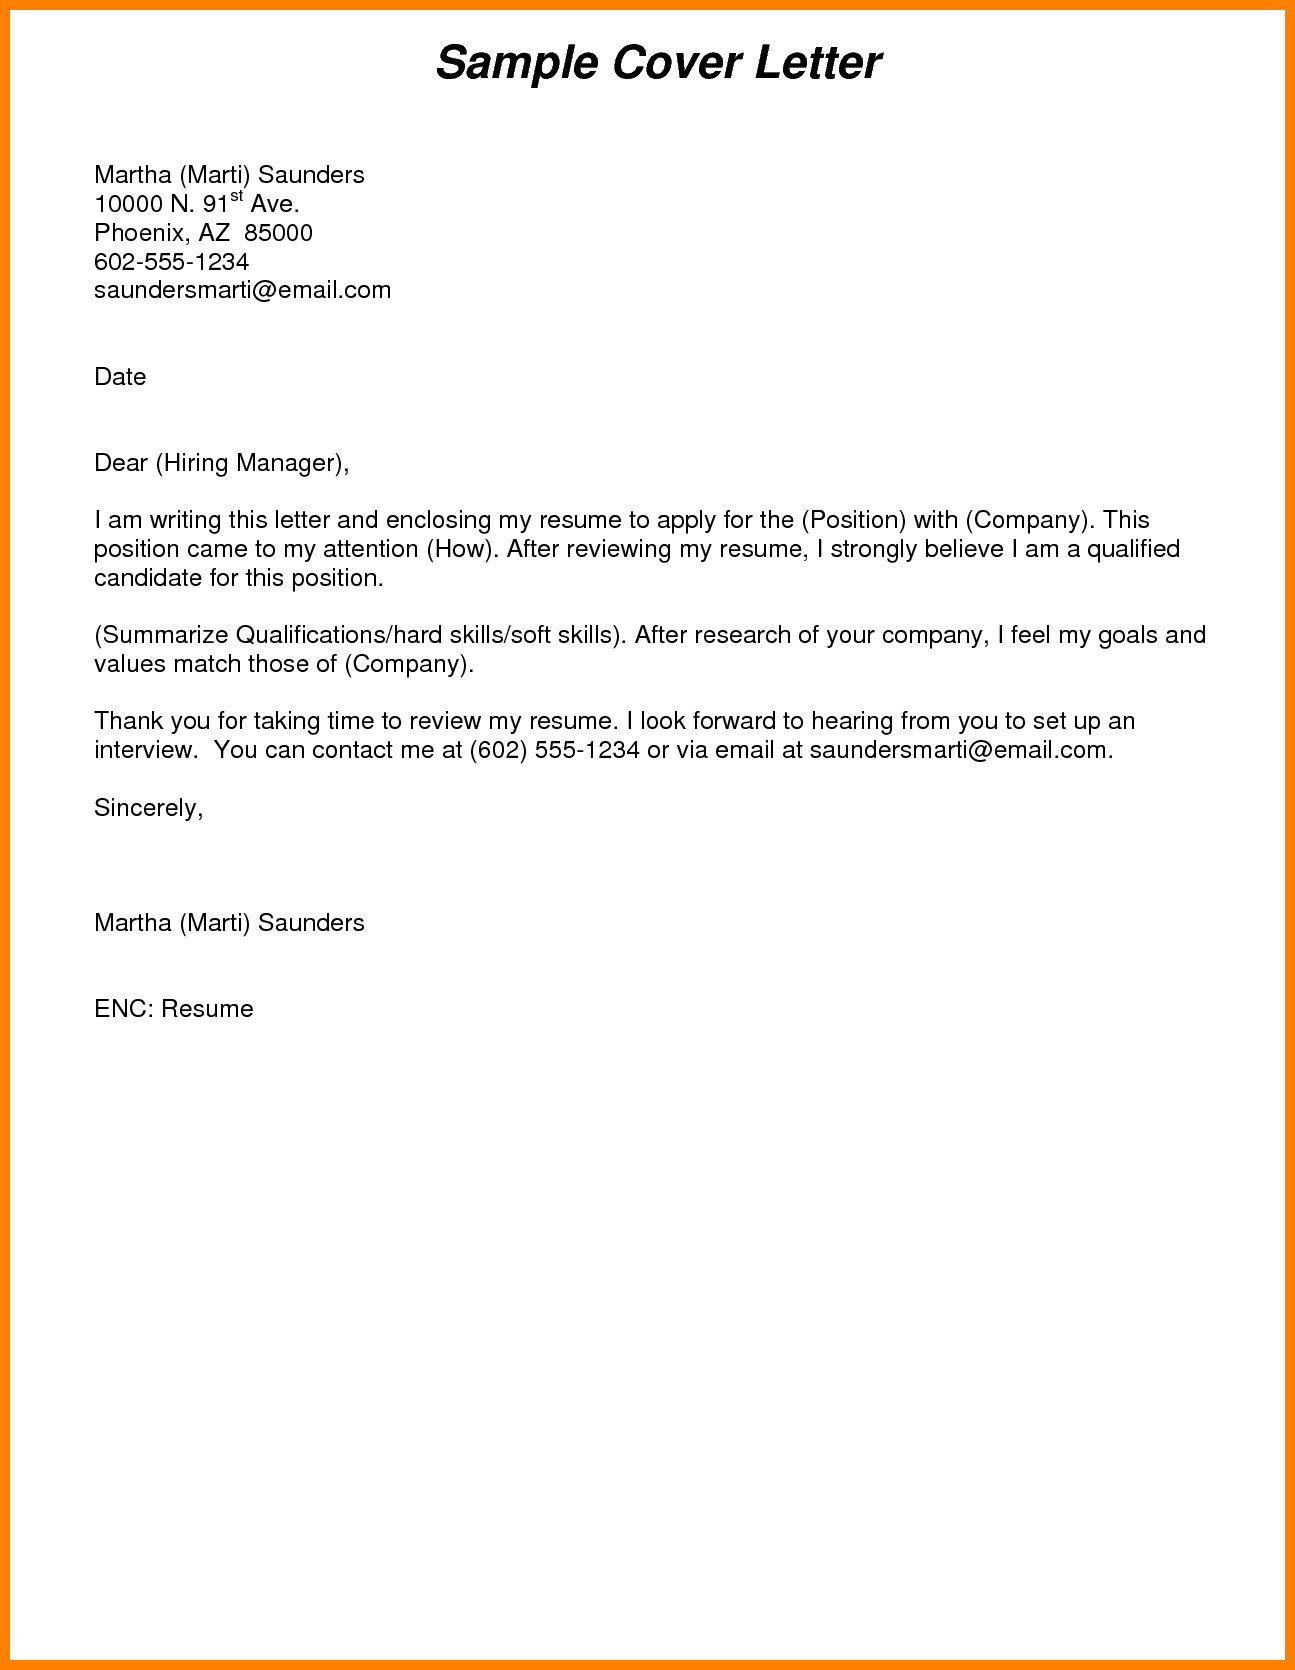 Sample Cover Letter For Resume Pdf Summary For Resume